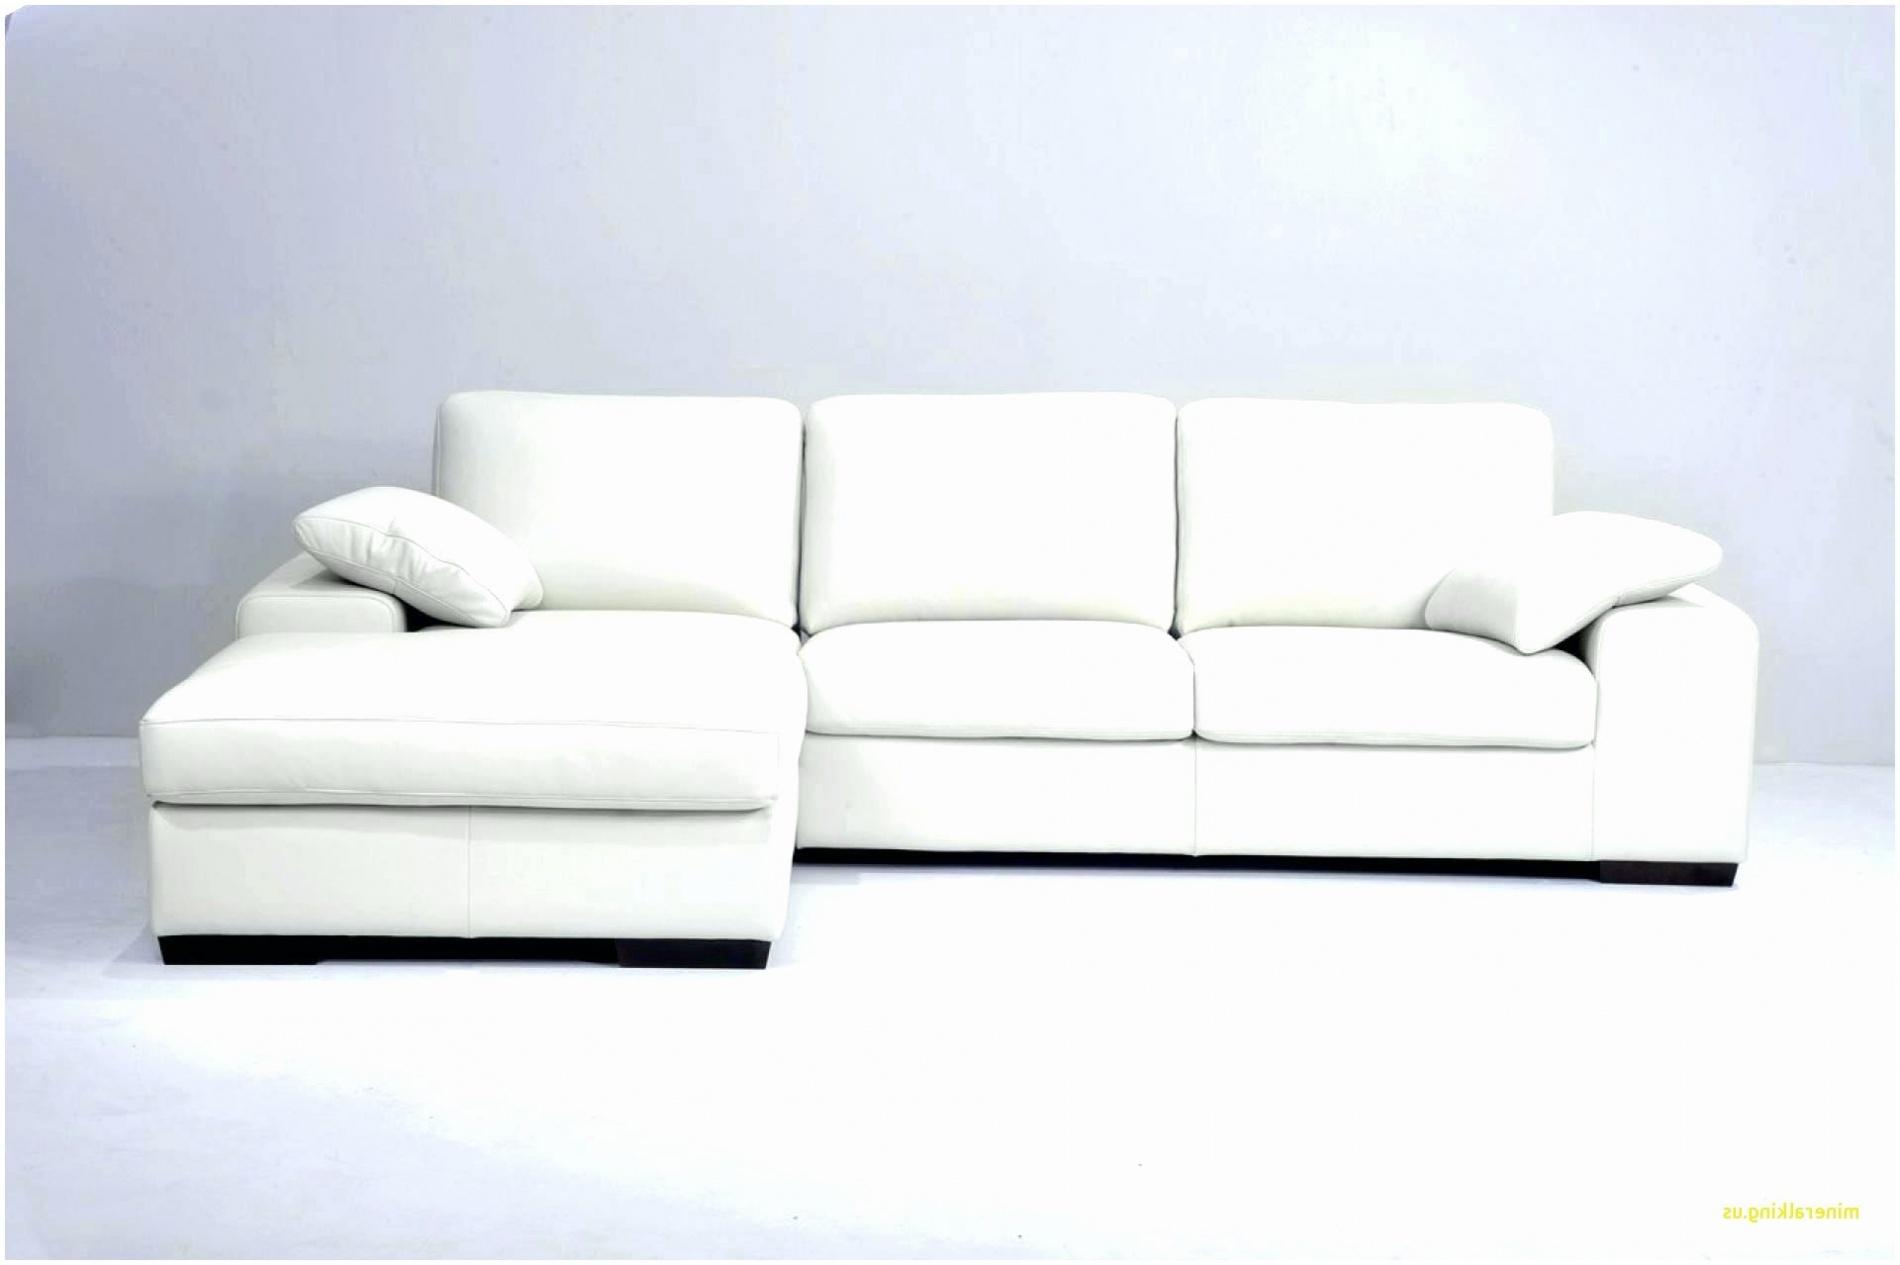 Ikea Canapé Angle Convertible Beau Image Maha De Canapé En Bois Mahagranda De Home